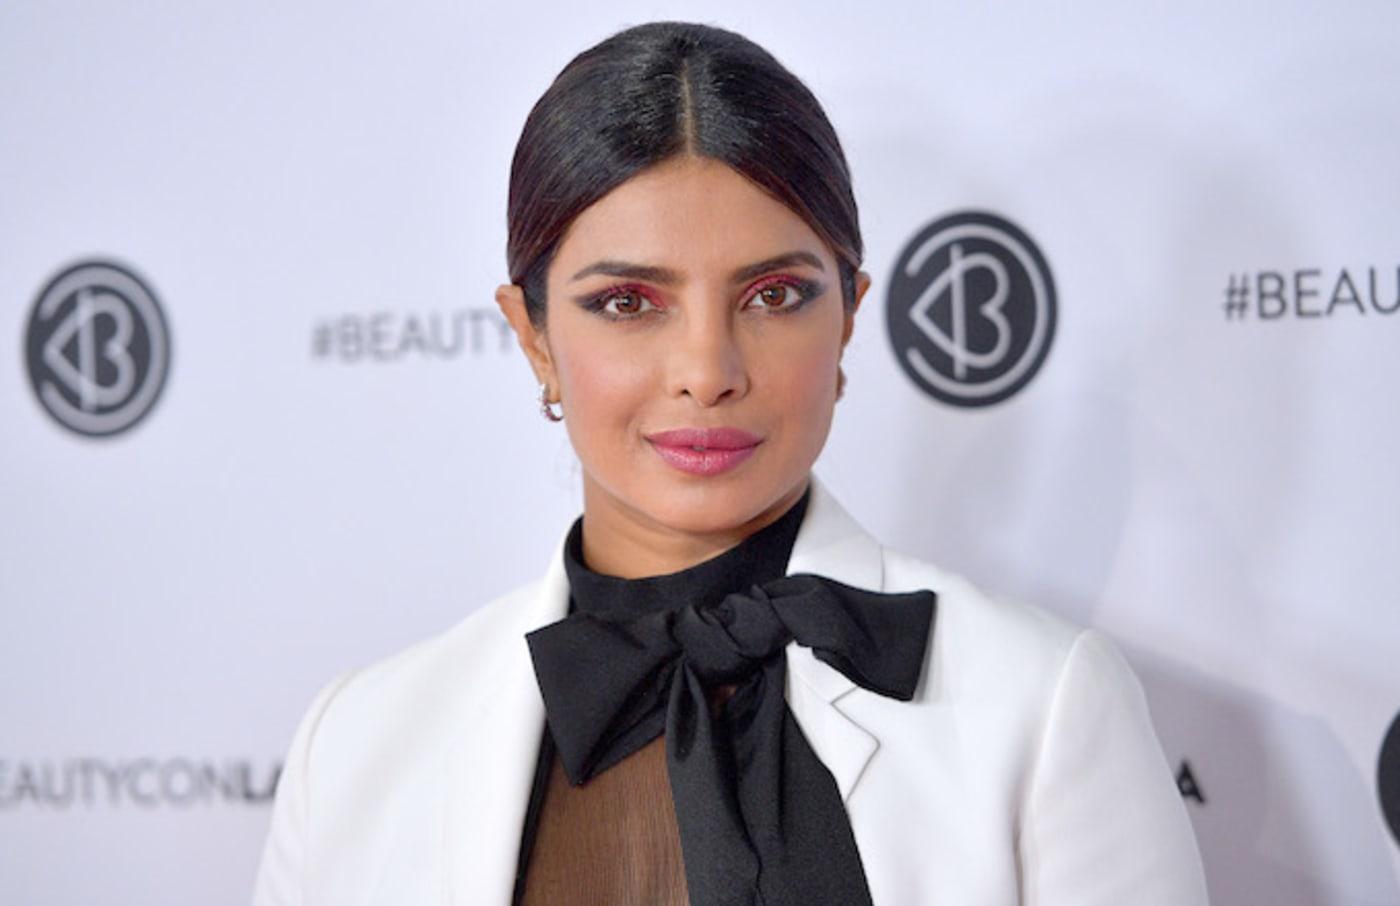 Priyanka Chopra attends Beautycon Los Angeles 2019 Pink Carpet.